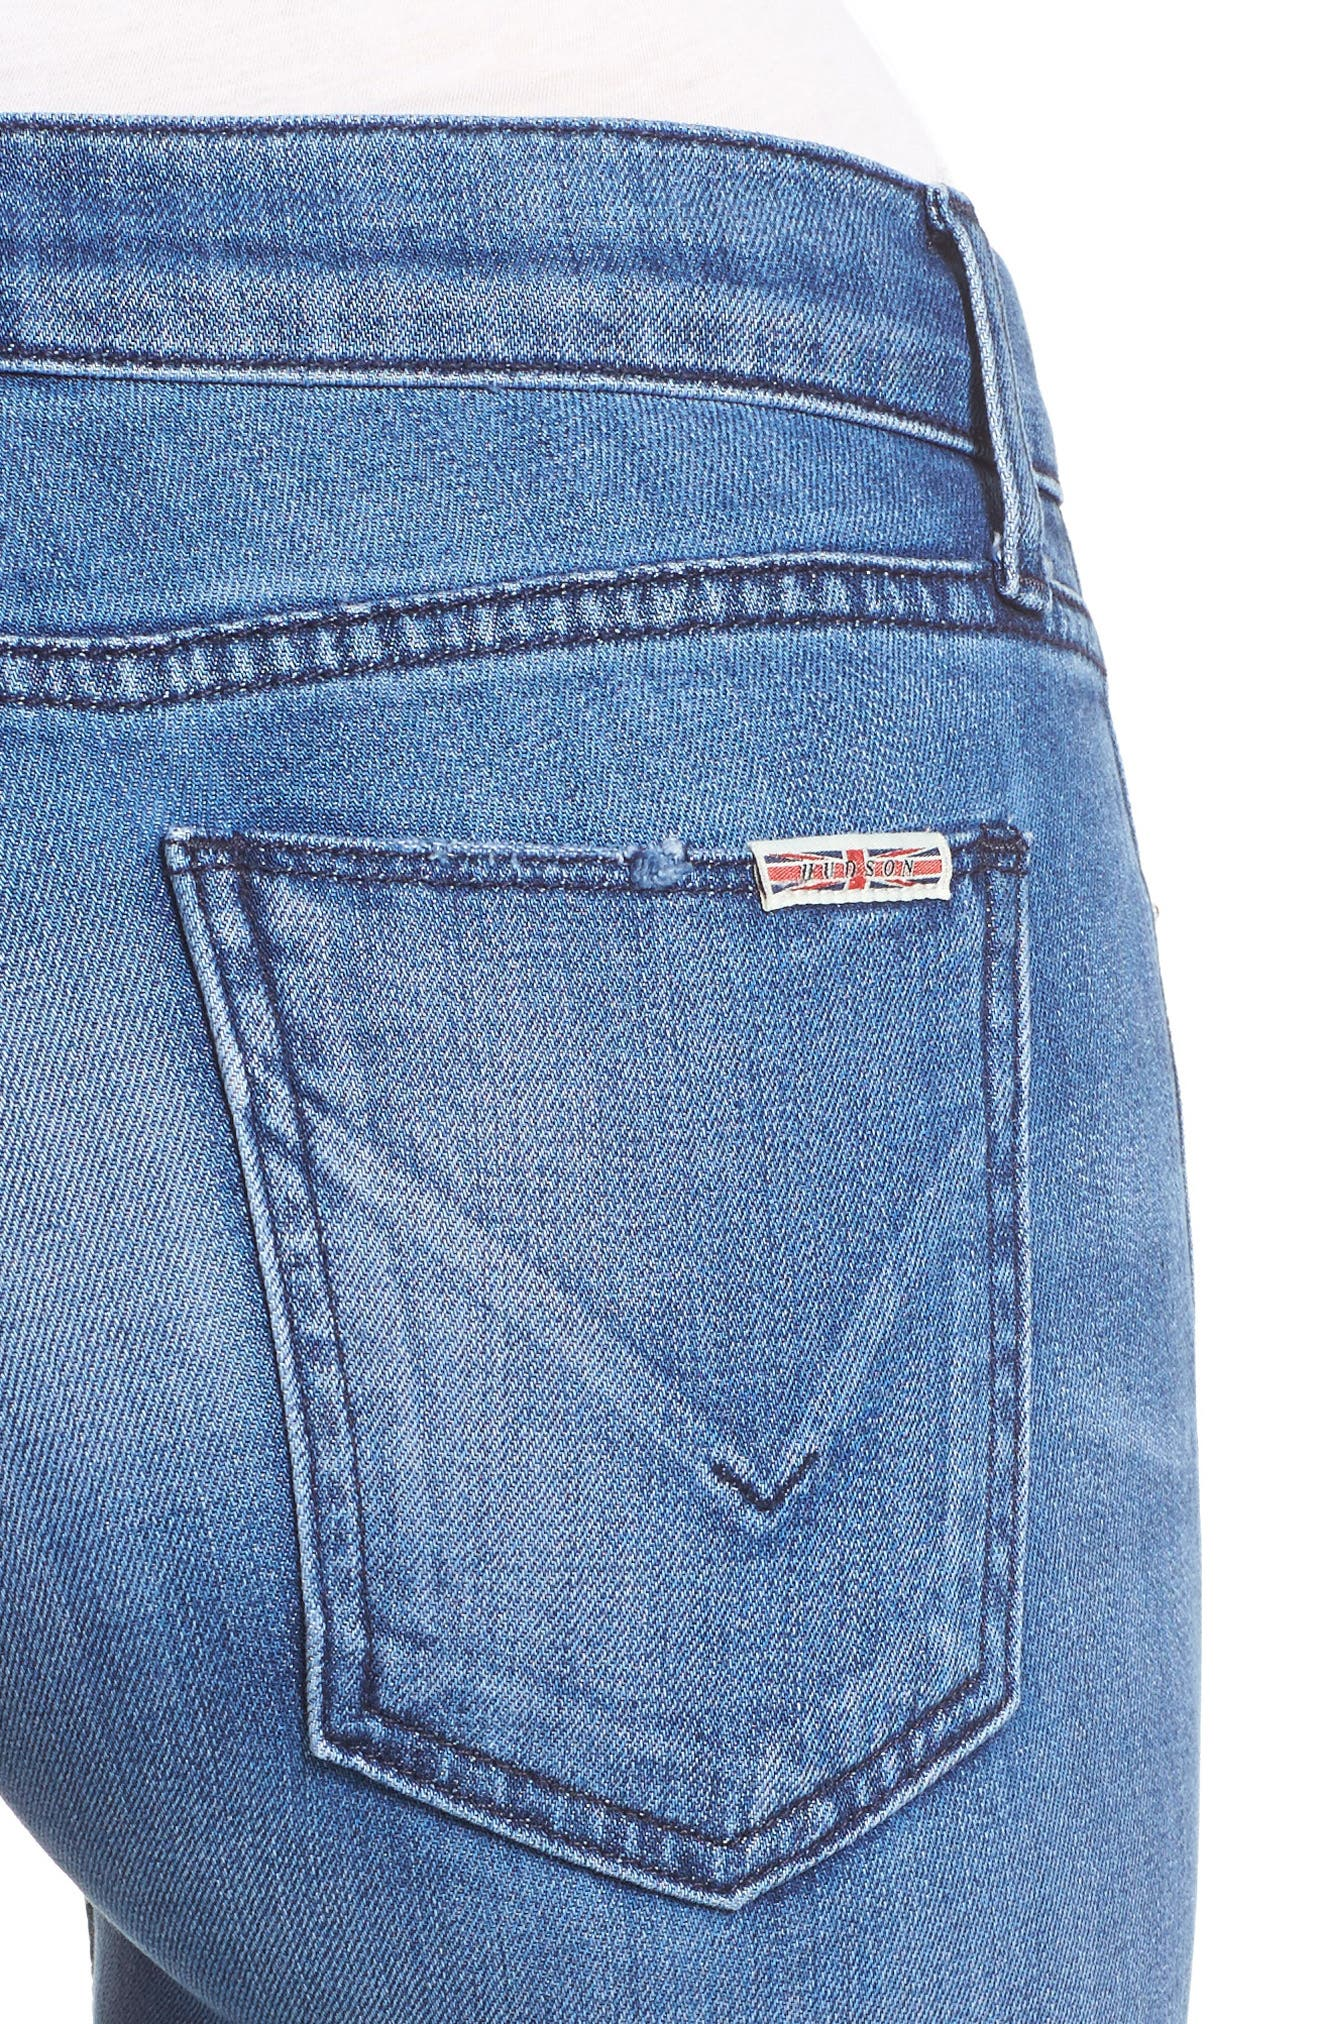 Alternate Image 4  - Hudson Tally Crop Skinny Jeans (Encounter)